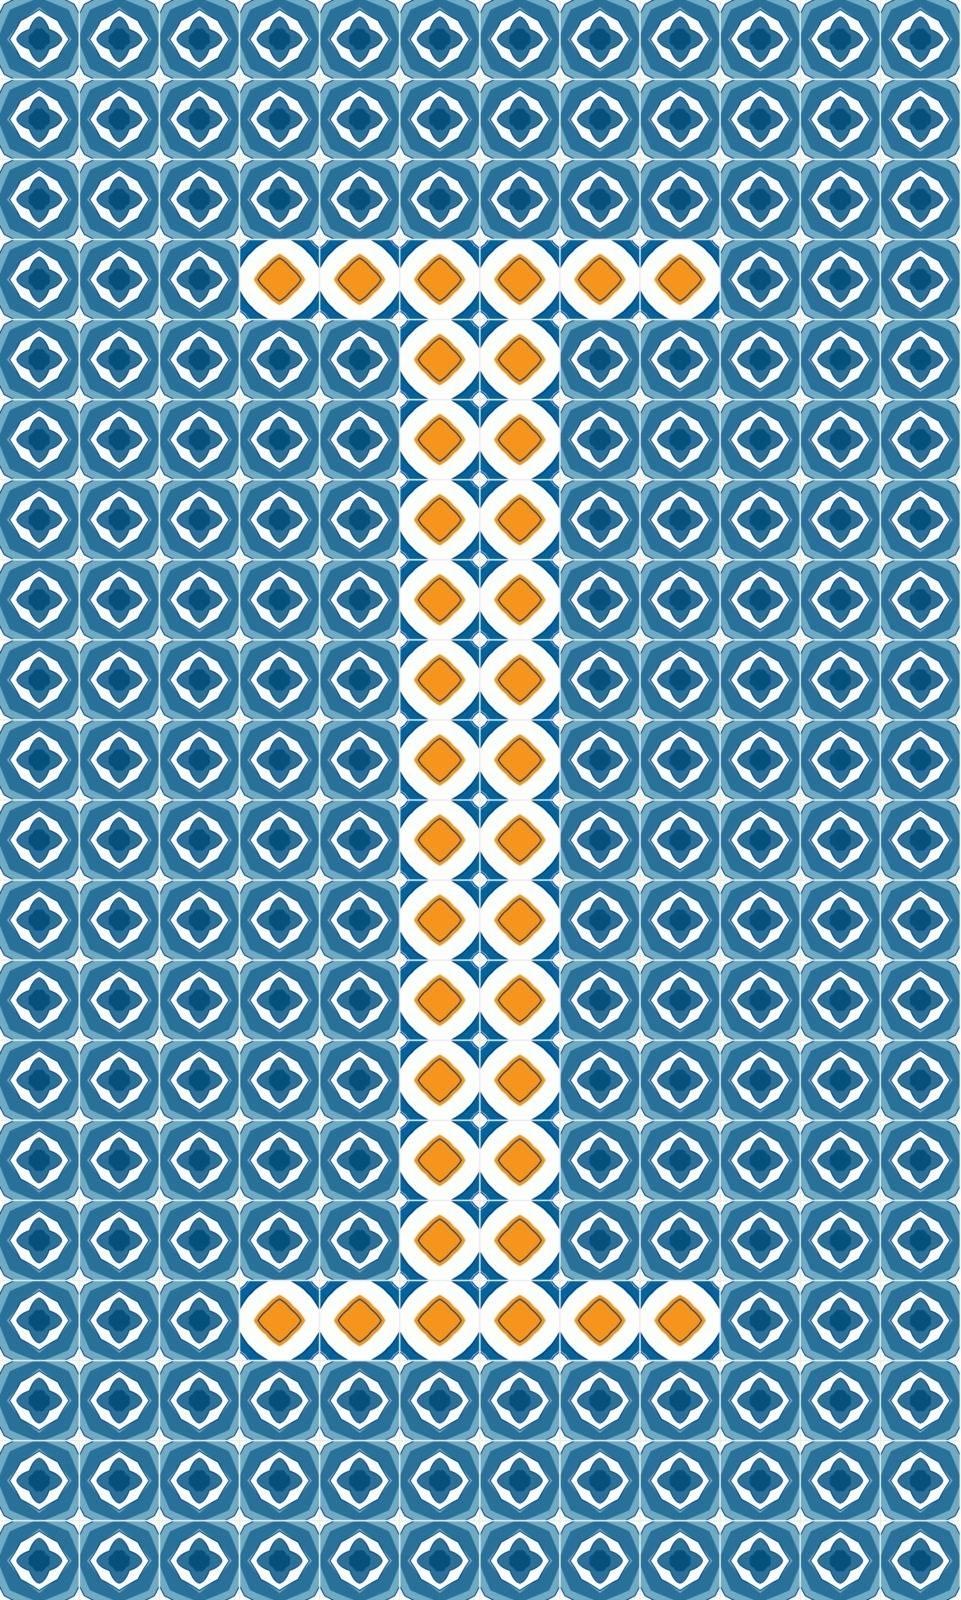 Capital letter I made of Portuguese tiles